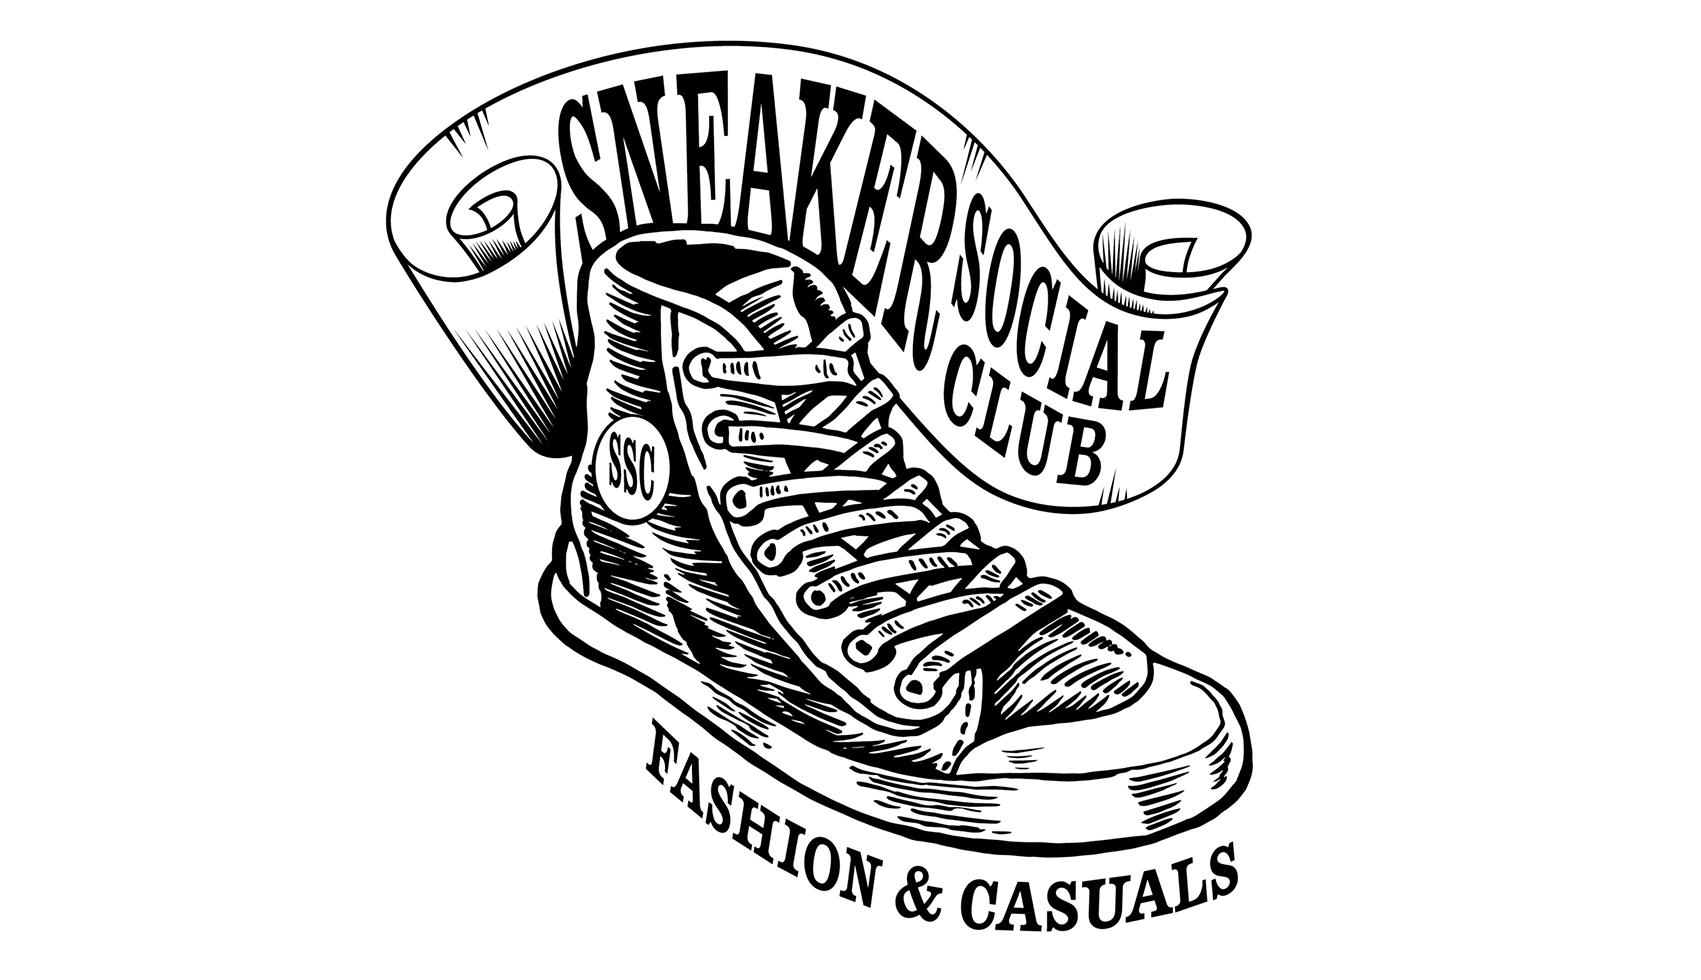 Dugout_Sneaker-Social-Club-logo_zw